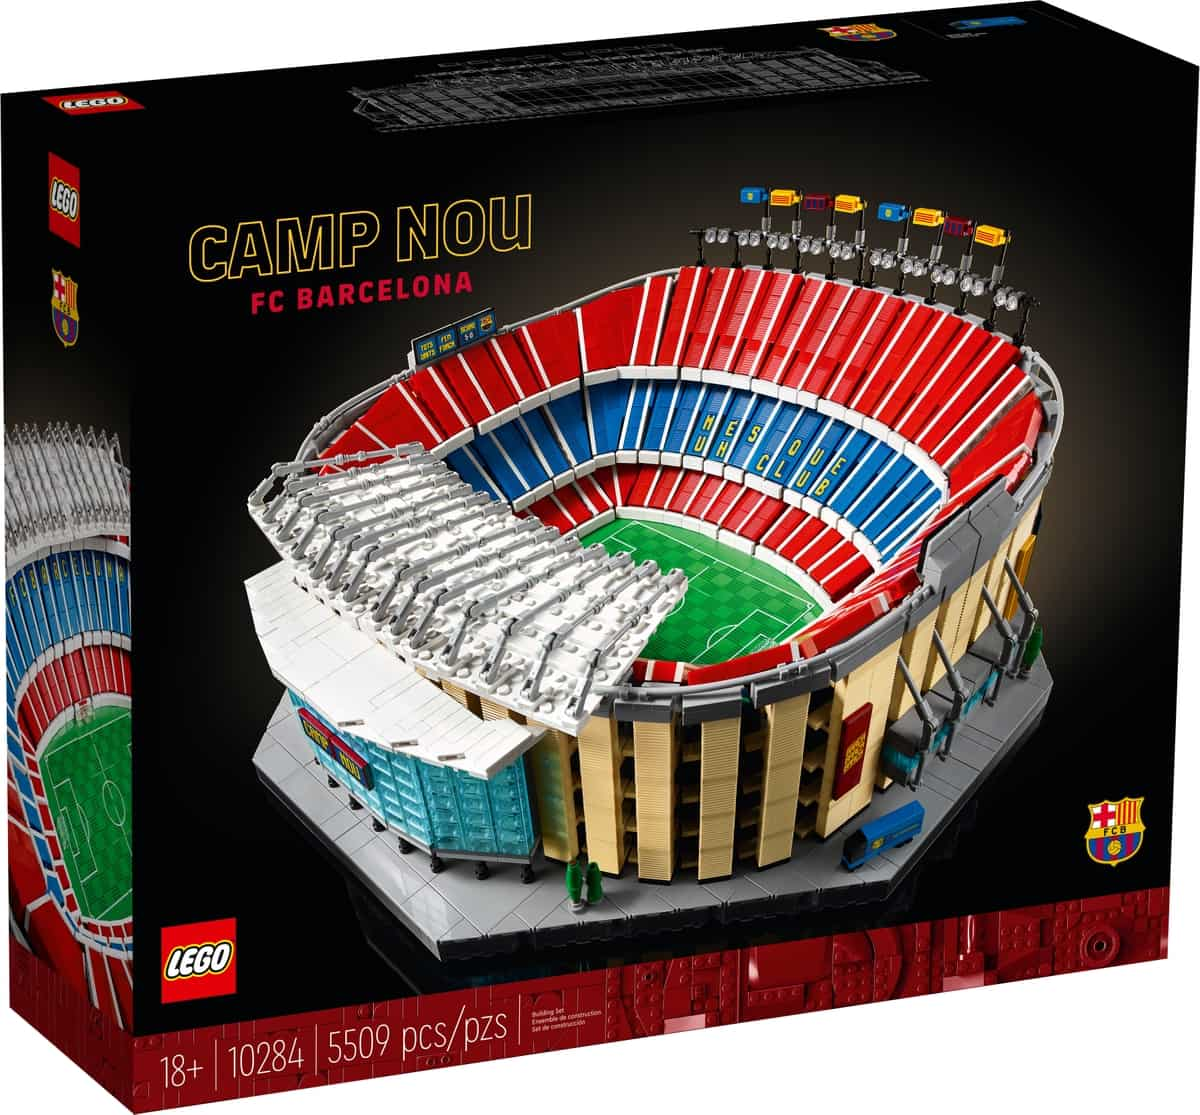 LEGO 10284 Camp Nou - FC Barcelona